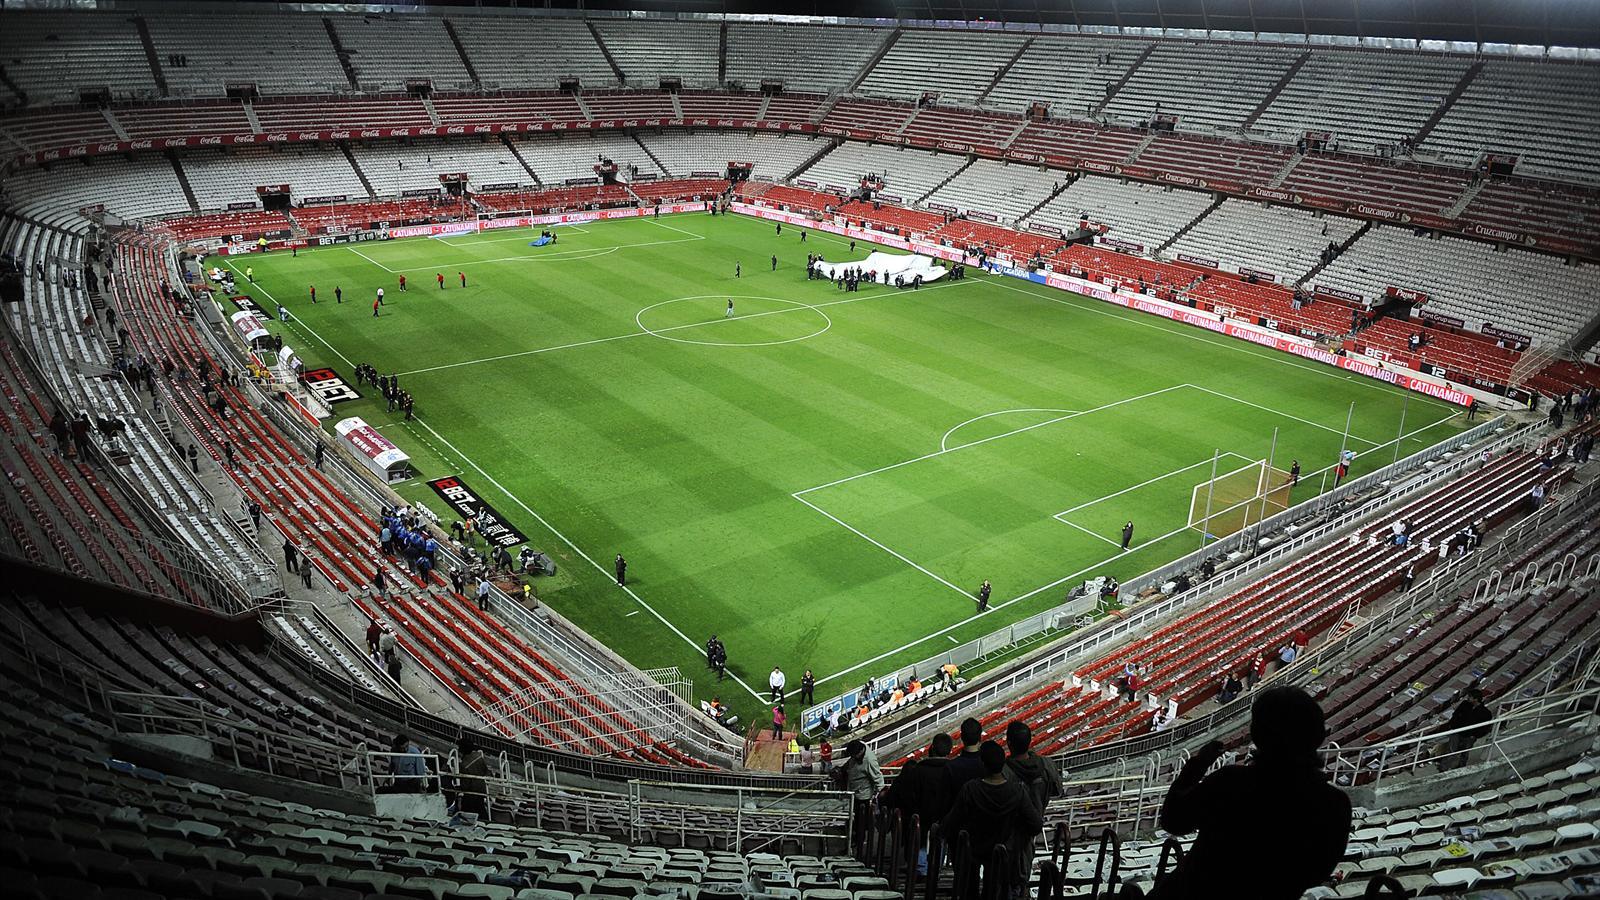 LIVE Sevilla Atlético - UD Almería - Liga adelante Football - 13 ... - Eurosport.com